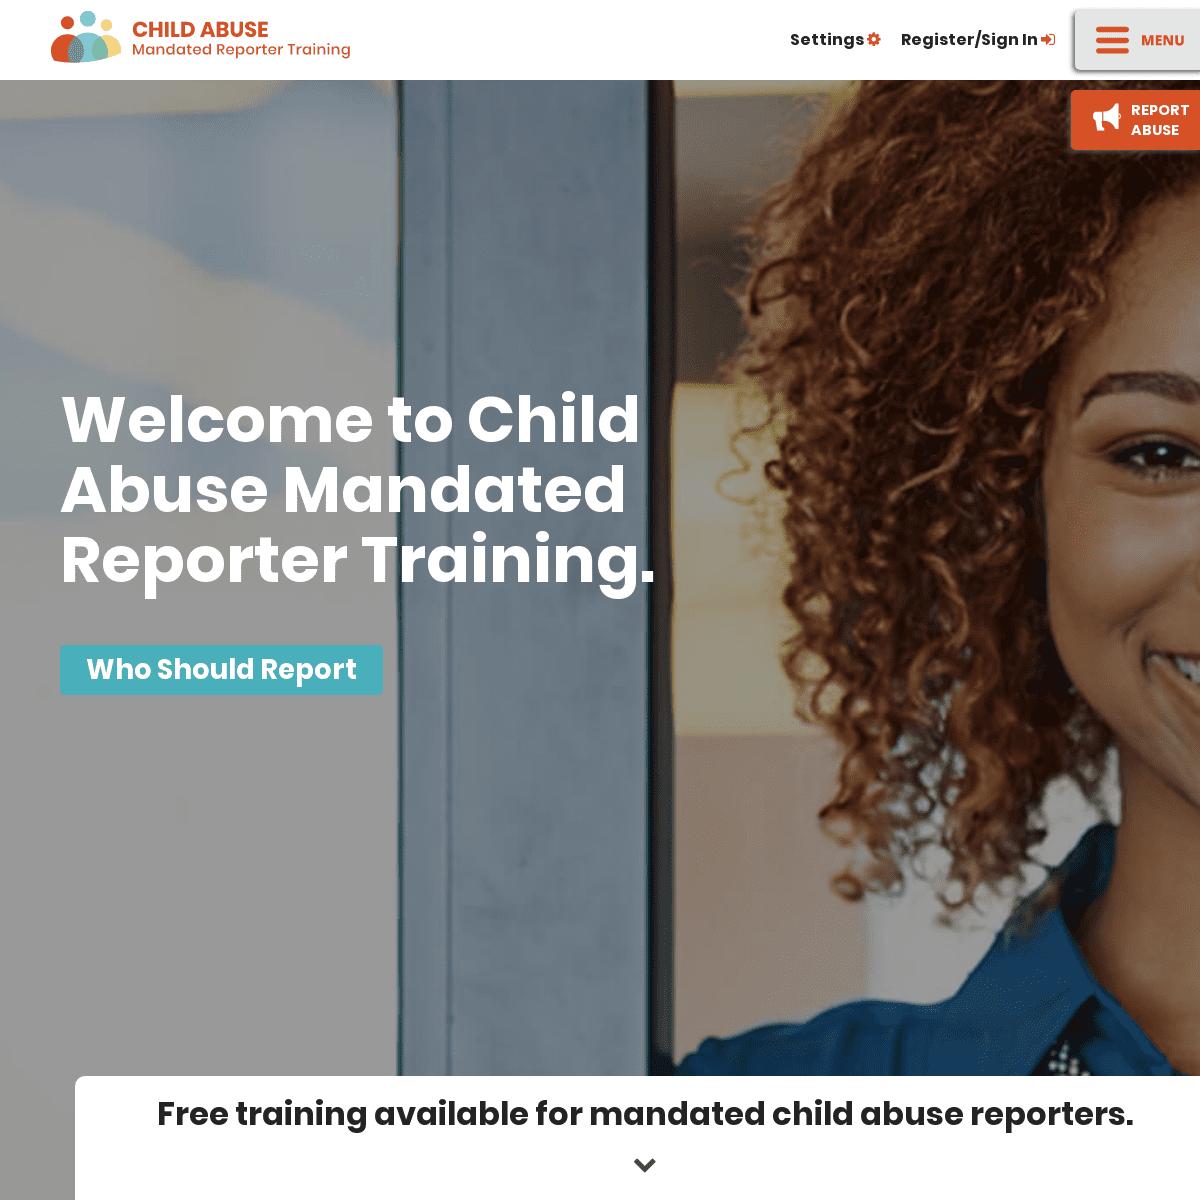 Child Abuse Mandated Reporter Training